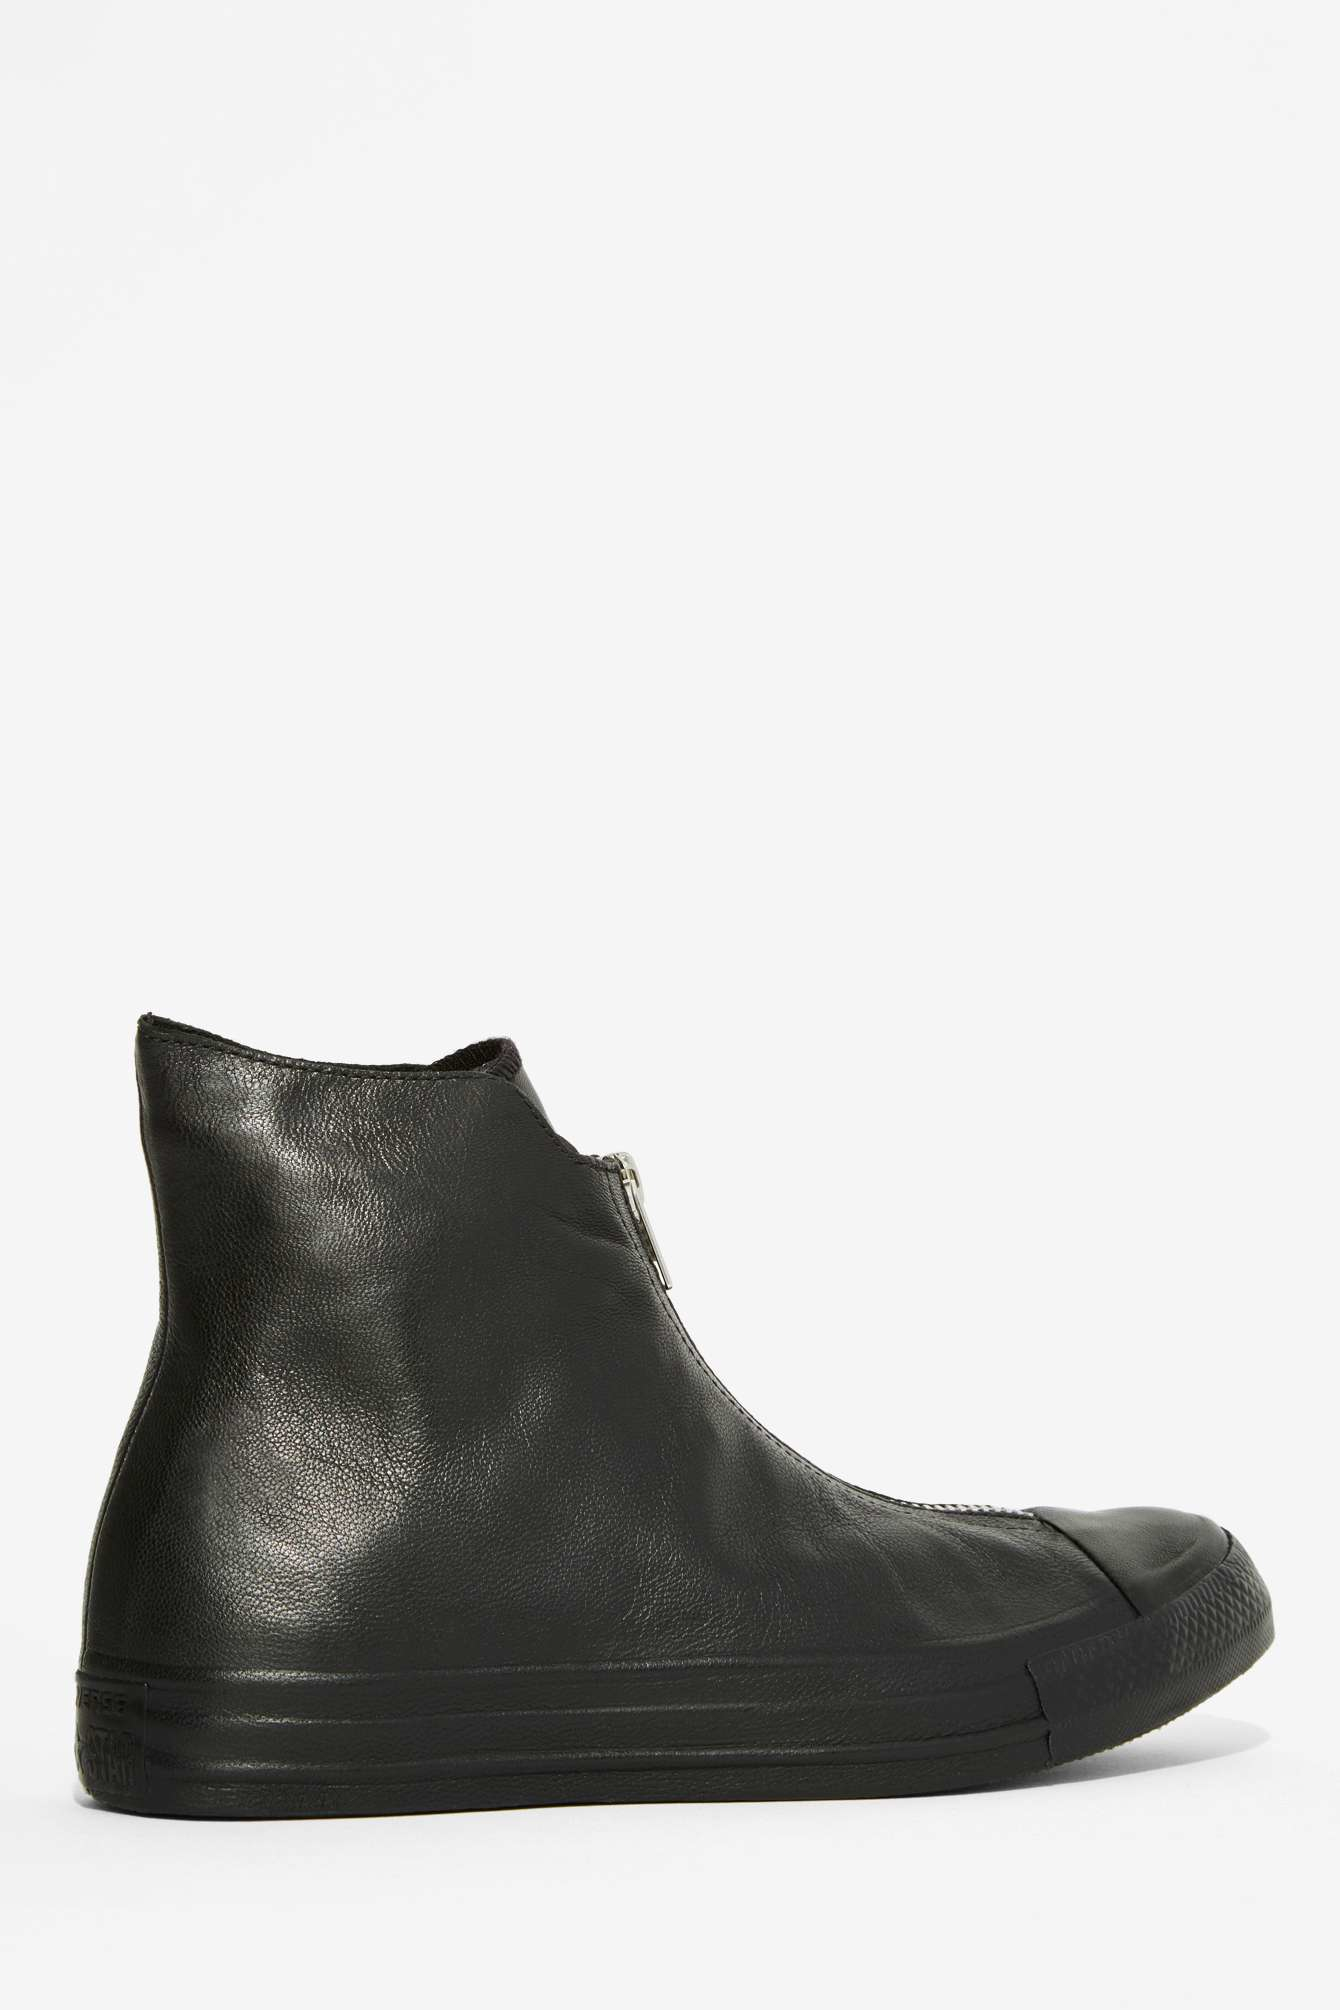 ba30dcdabf61 Lyst - Converse Chuck Taylor All Star Shroud Leather Hi-top-sneaker ...